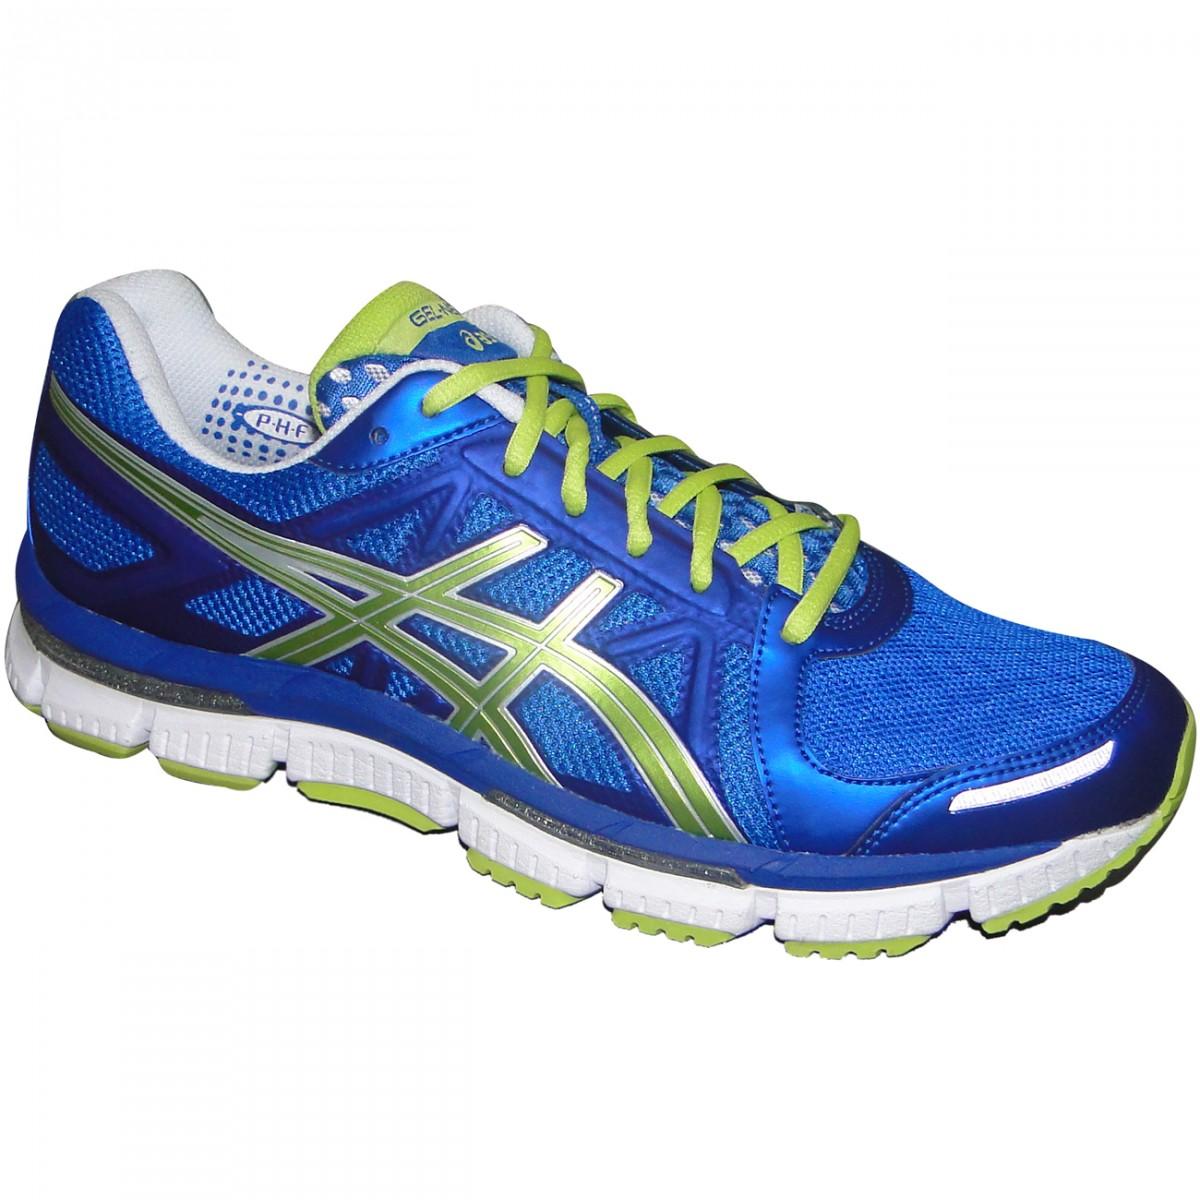 Tenis Asics Gel-Neo33 T222N-5925 - Azul Limao - Chuteira Nike ... eca1cba53fab0